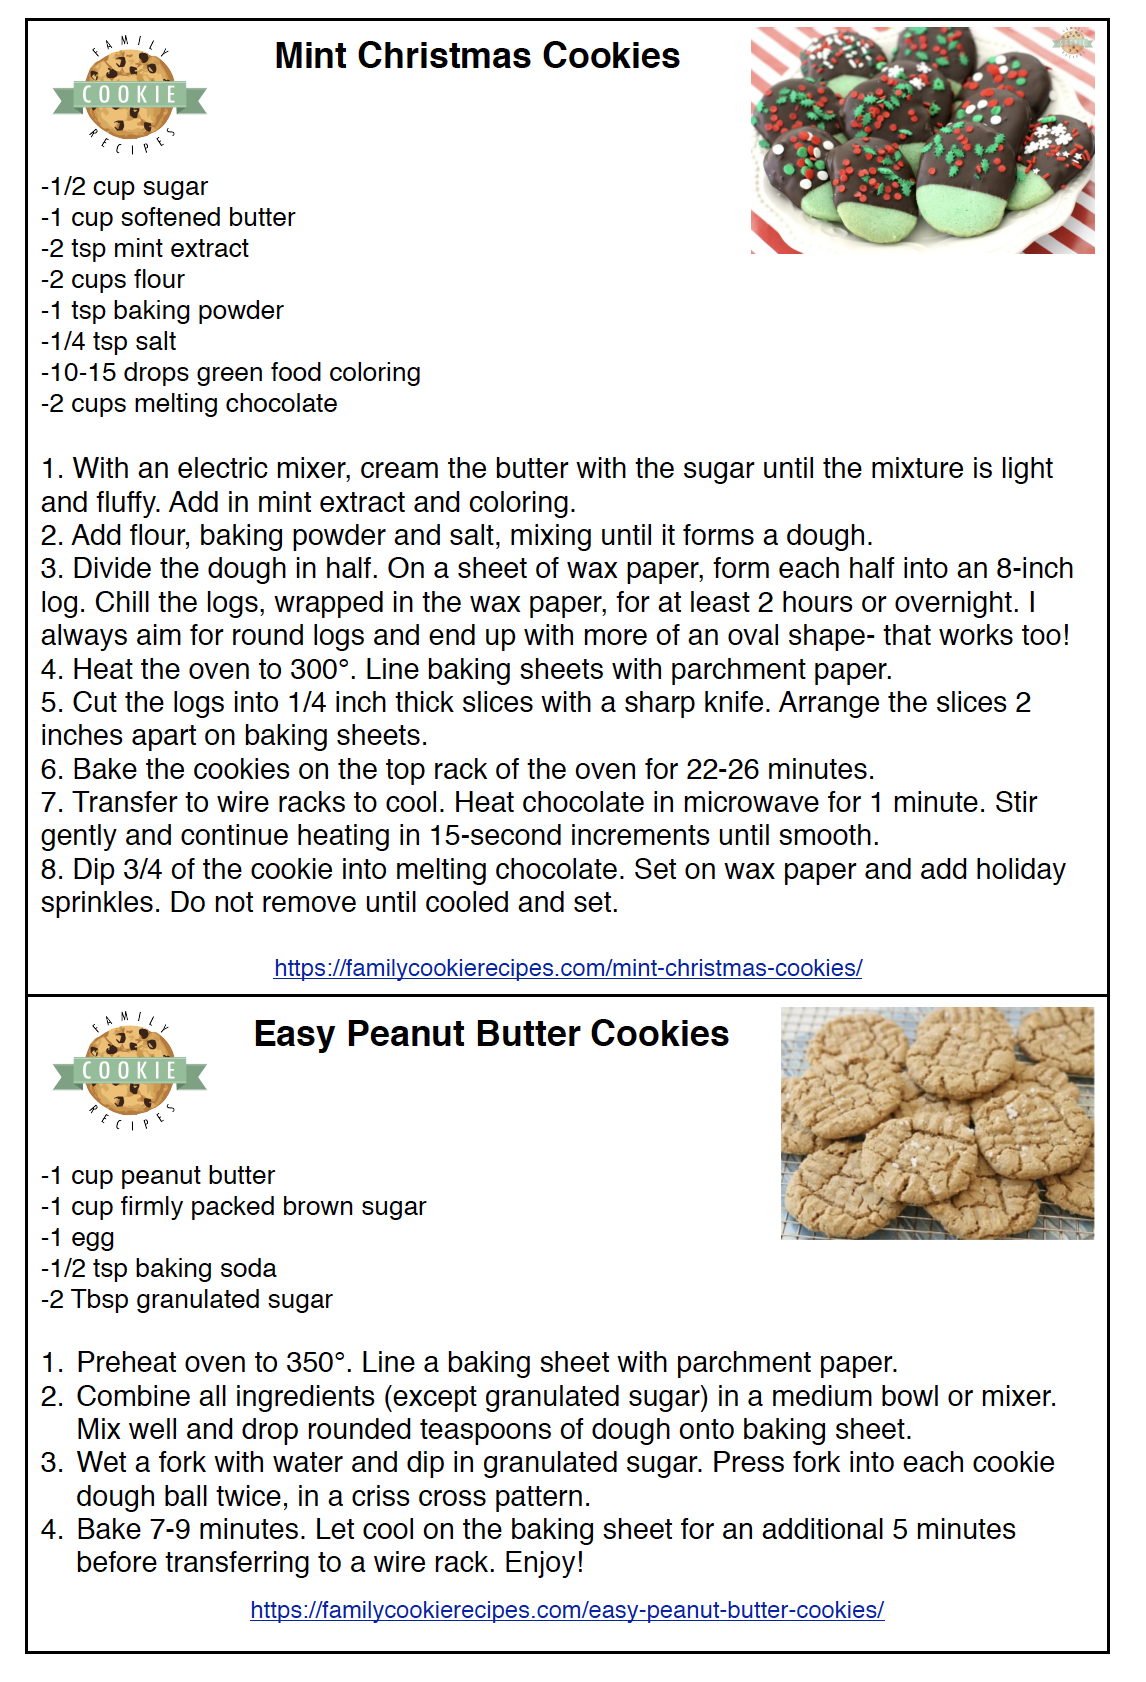 Printable Cookie Recipes